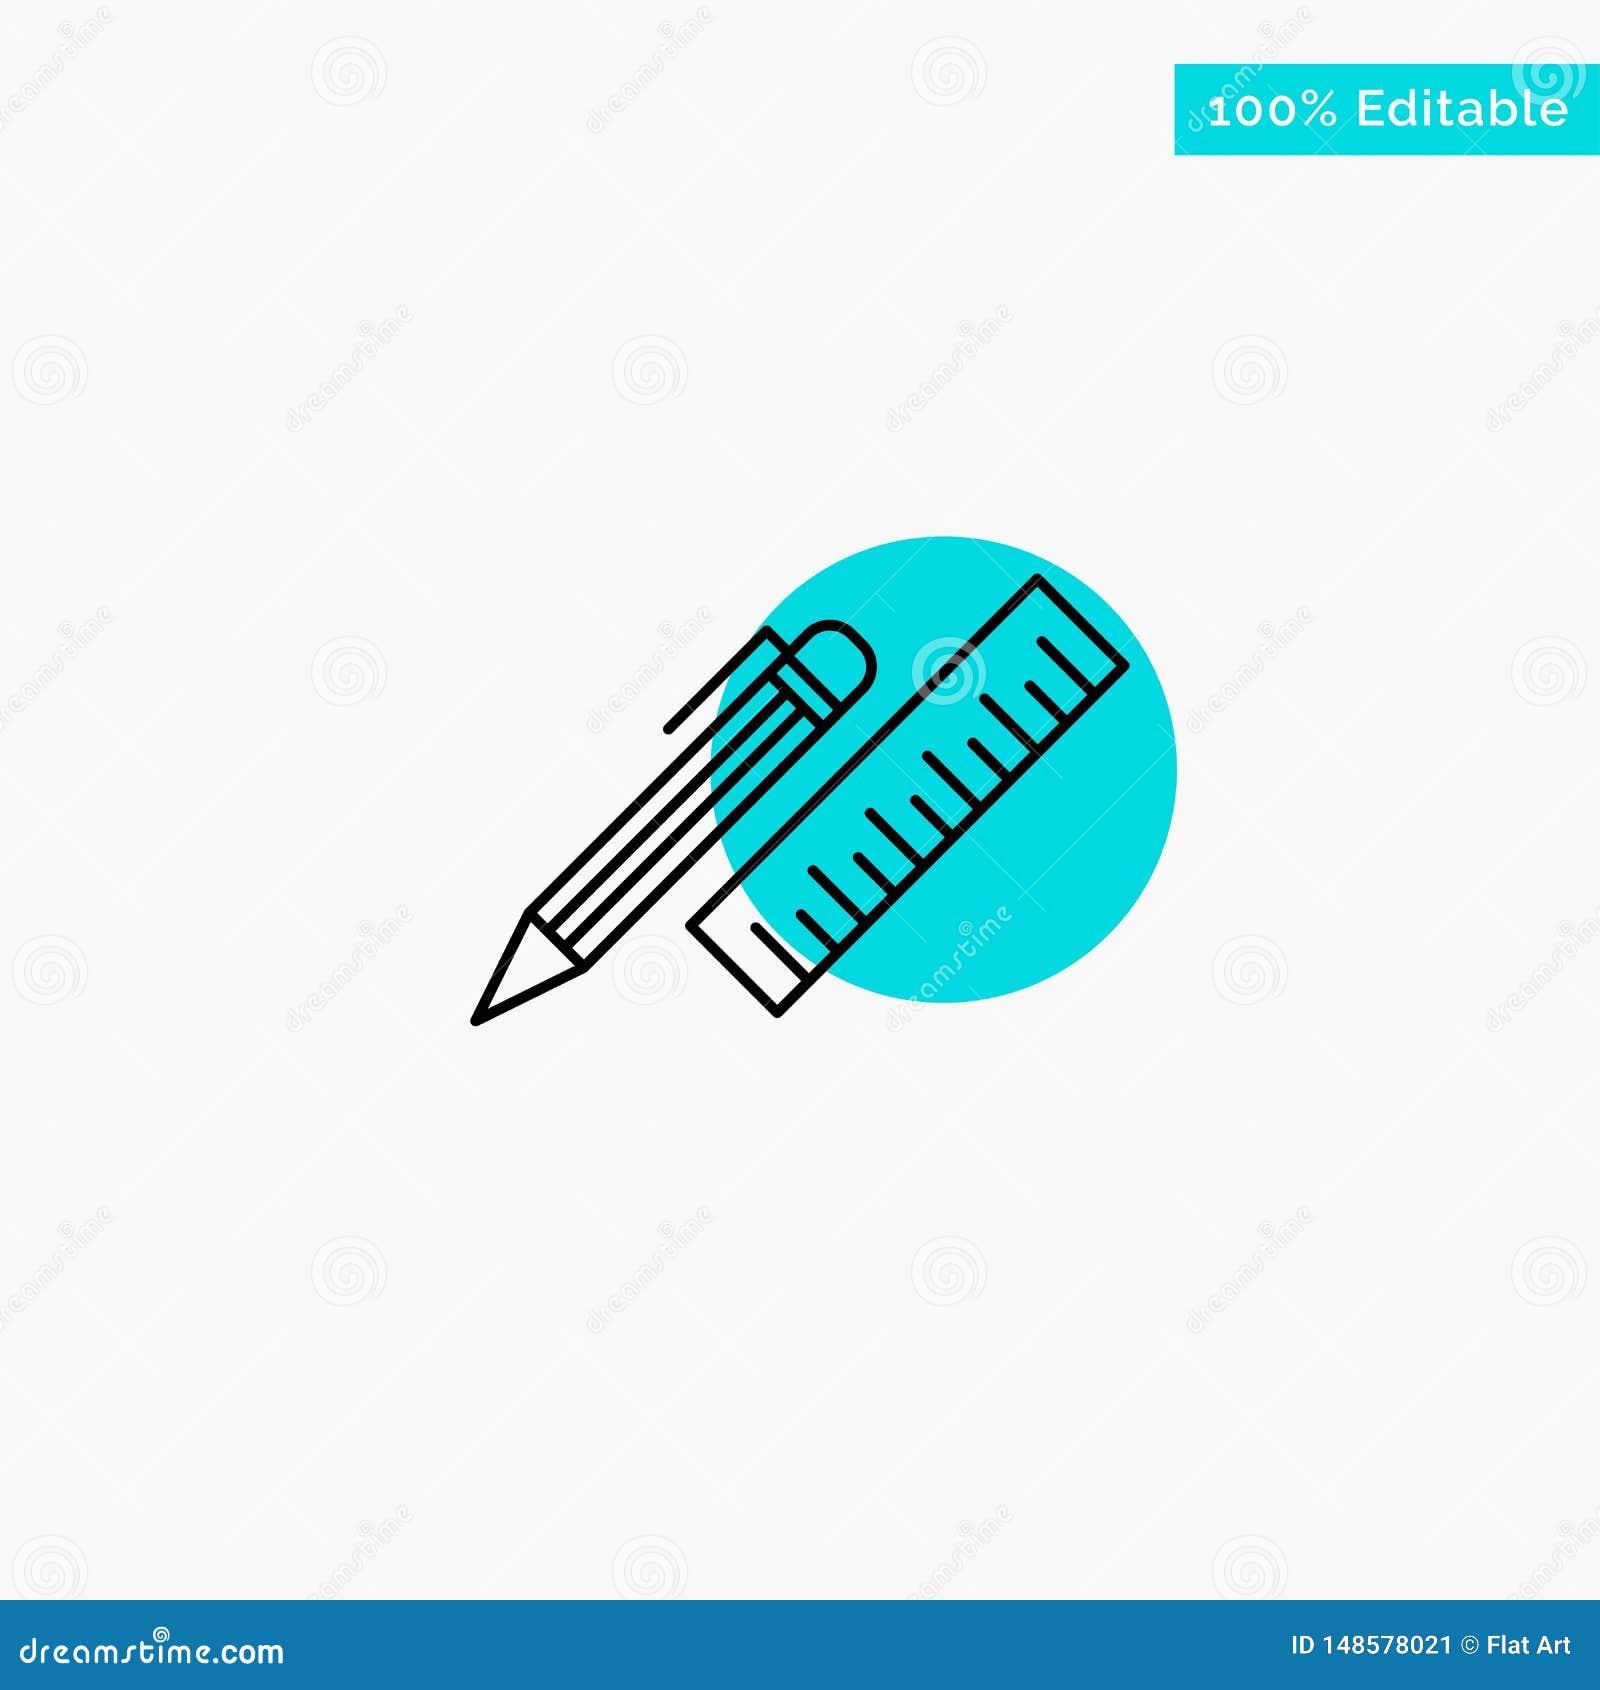 Pen Desk Organizer Pencil Ruler Supplies Turquoise Highlight